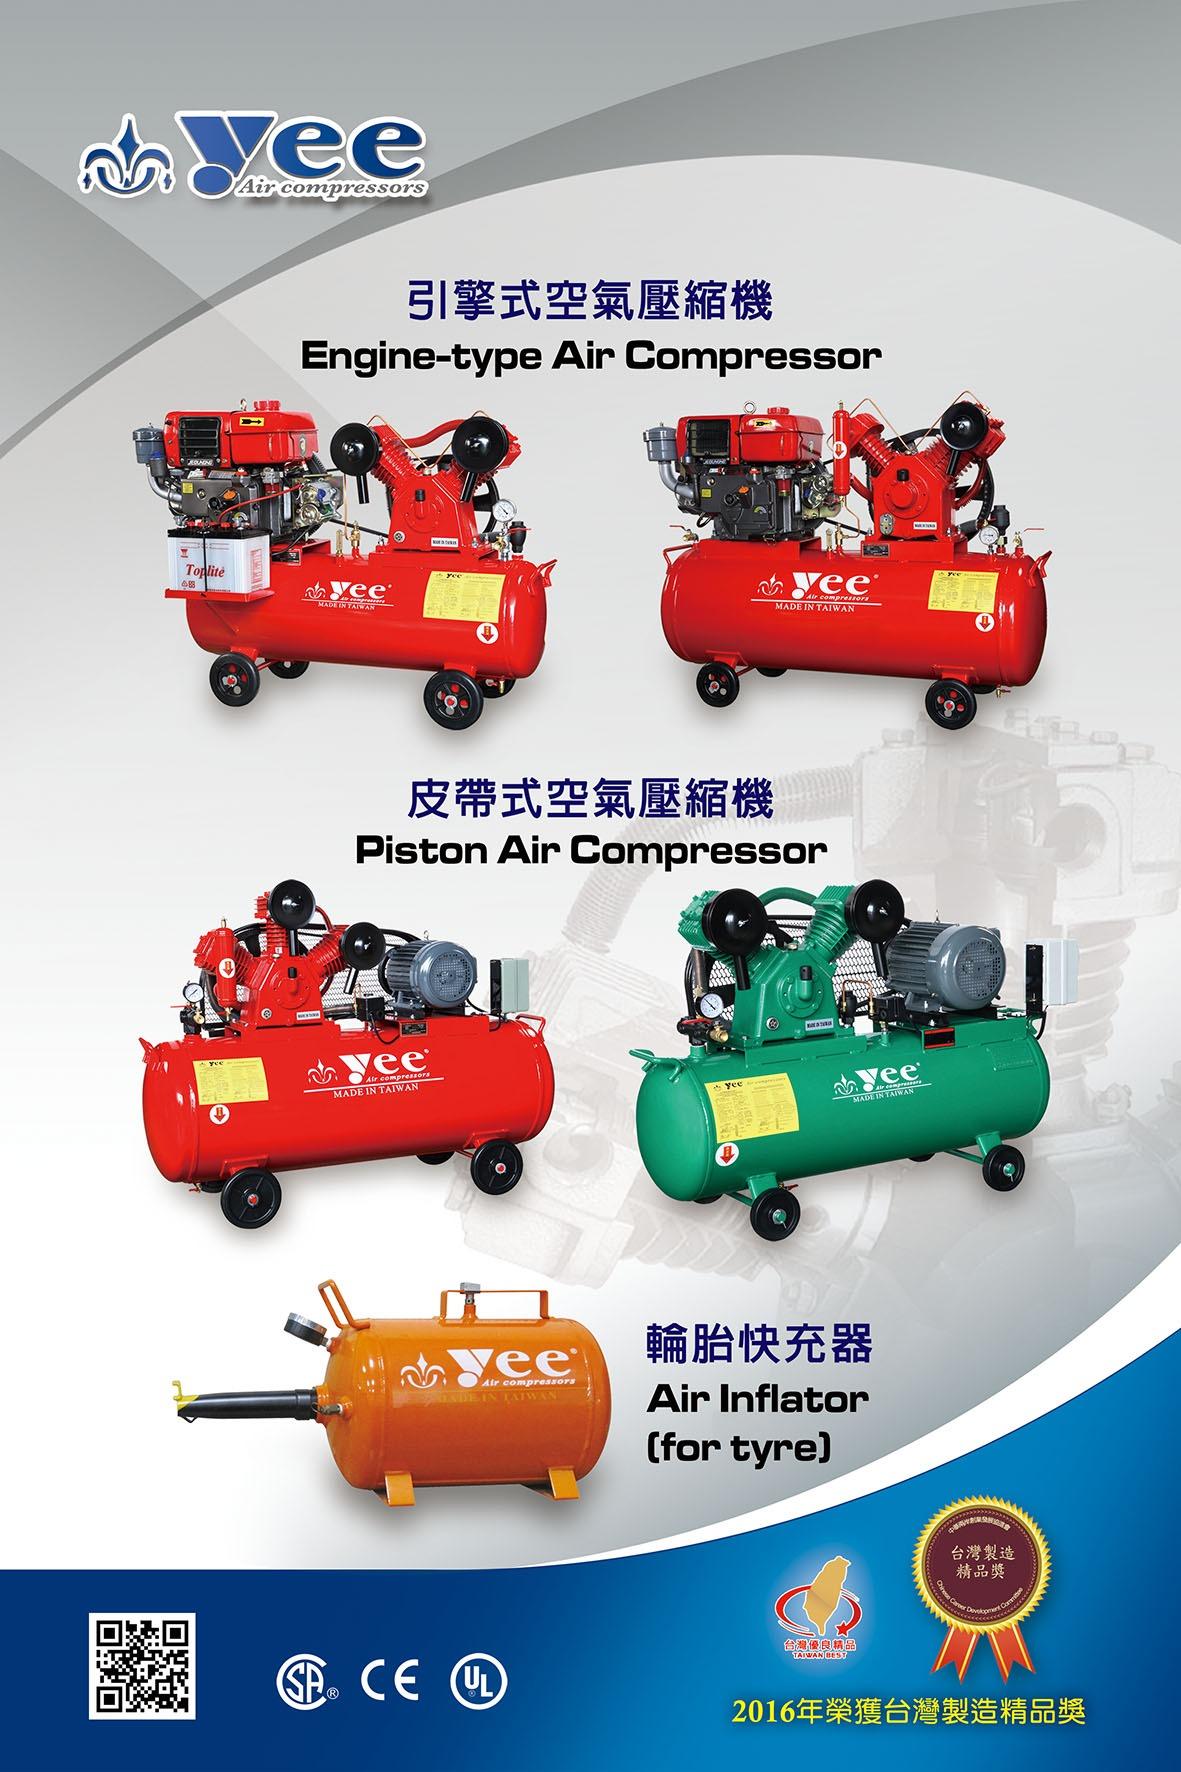 Automobile Air Compressor for Repair / Maintenance Equipment made by MIN LI ZEN CO., LTD. 敏力升企業有限公司 - MatchSupplier.com